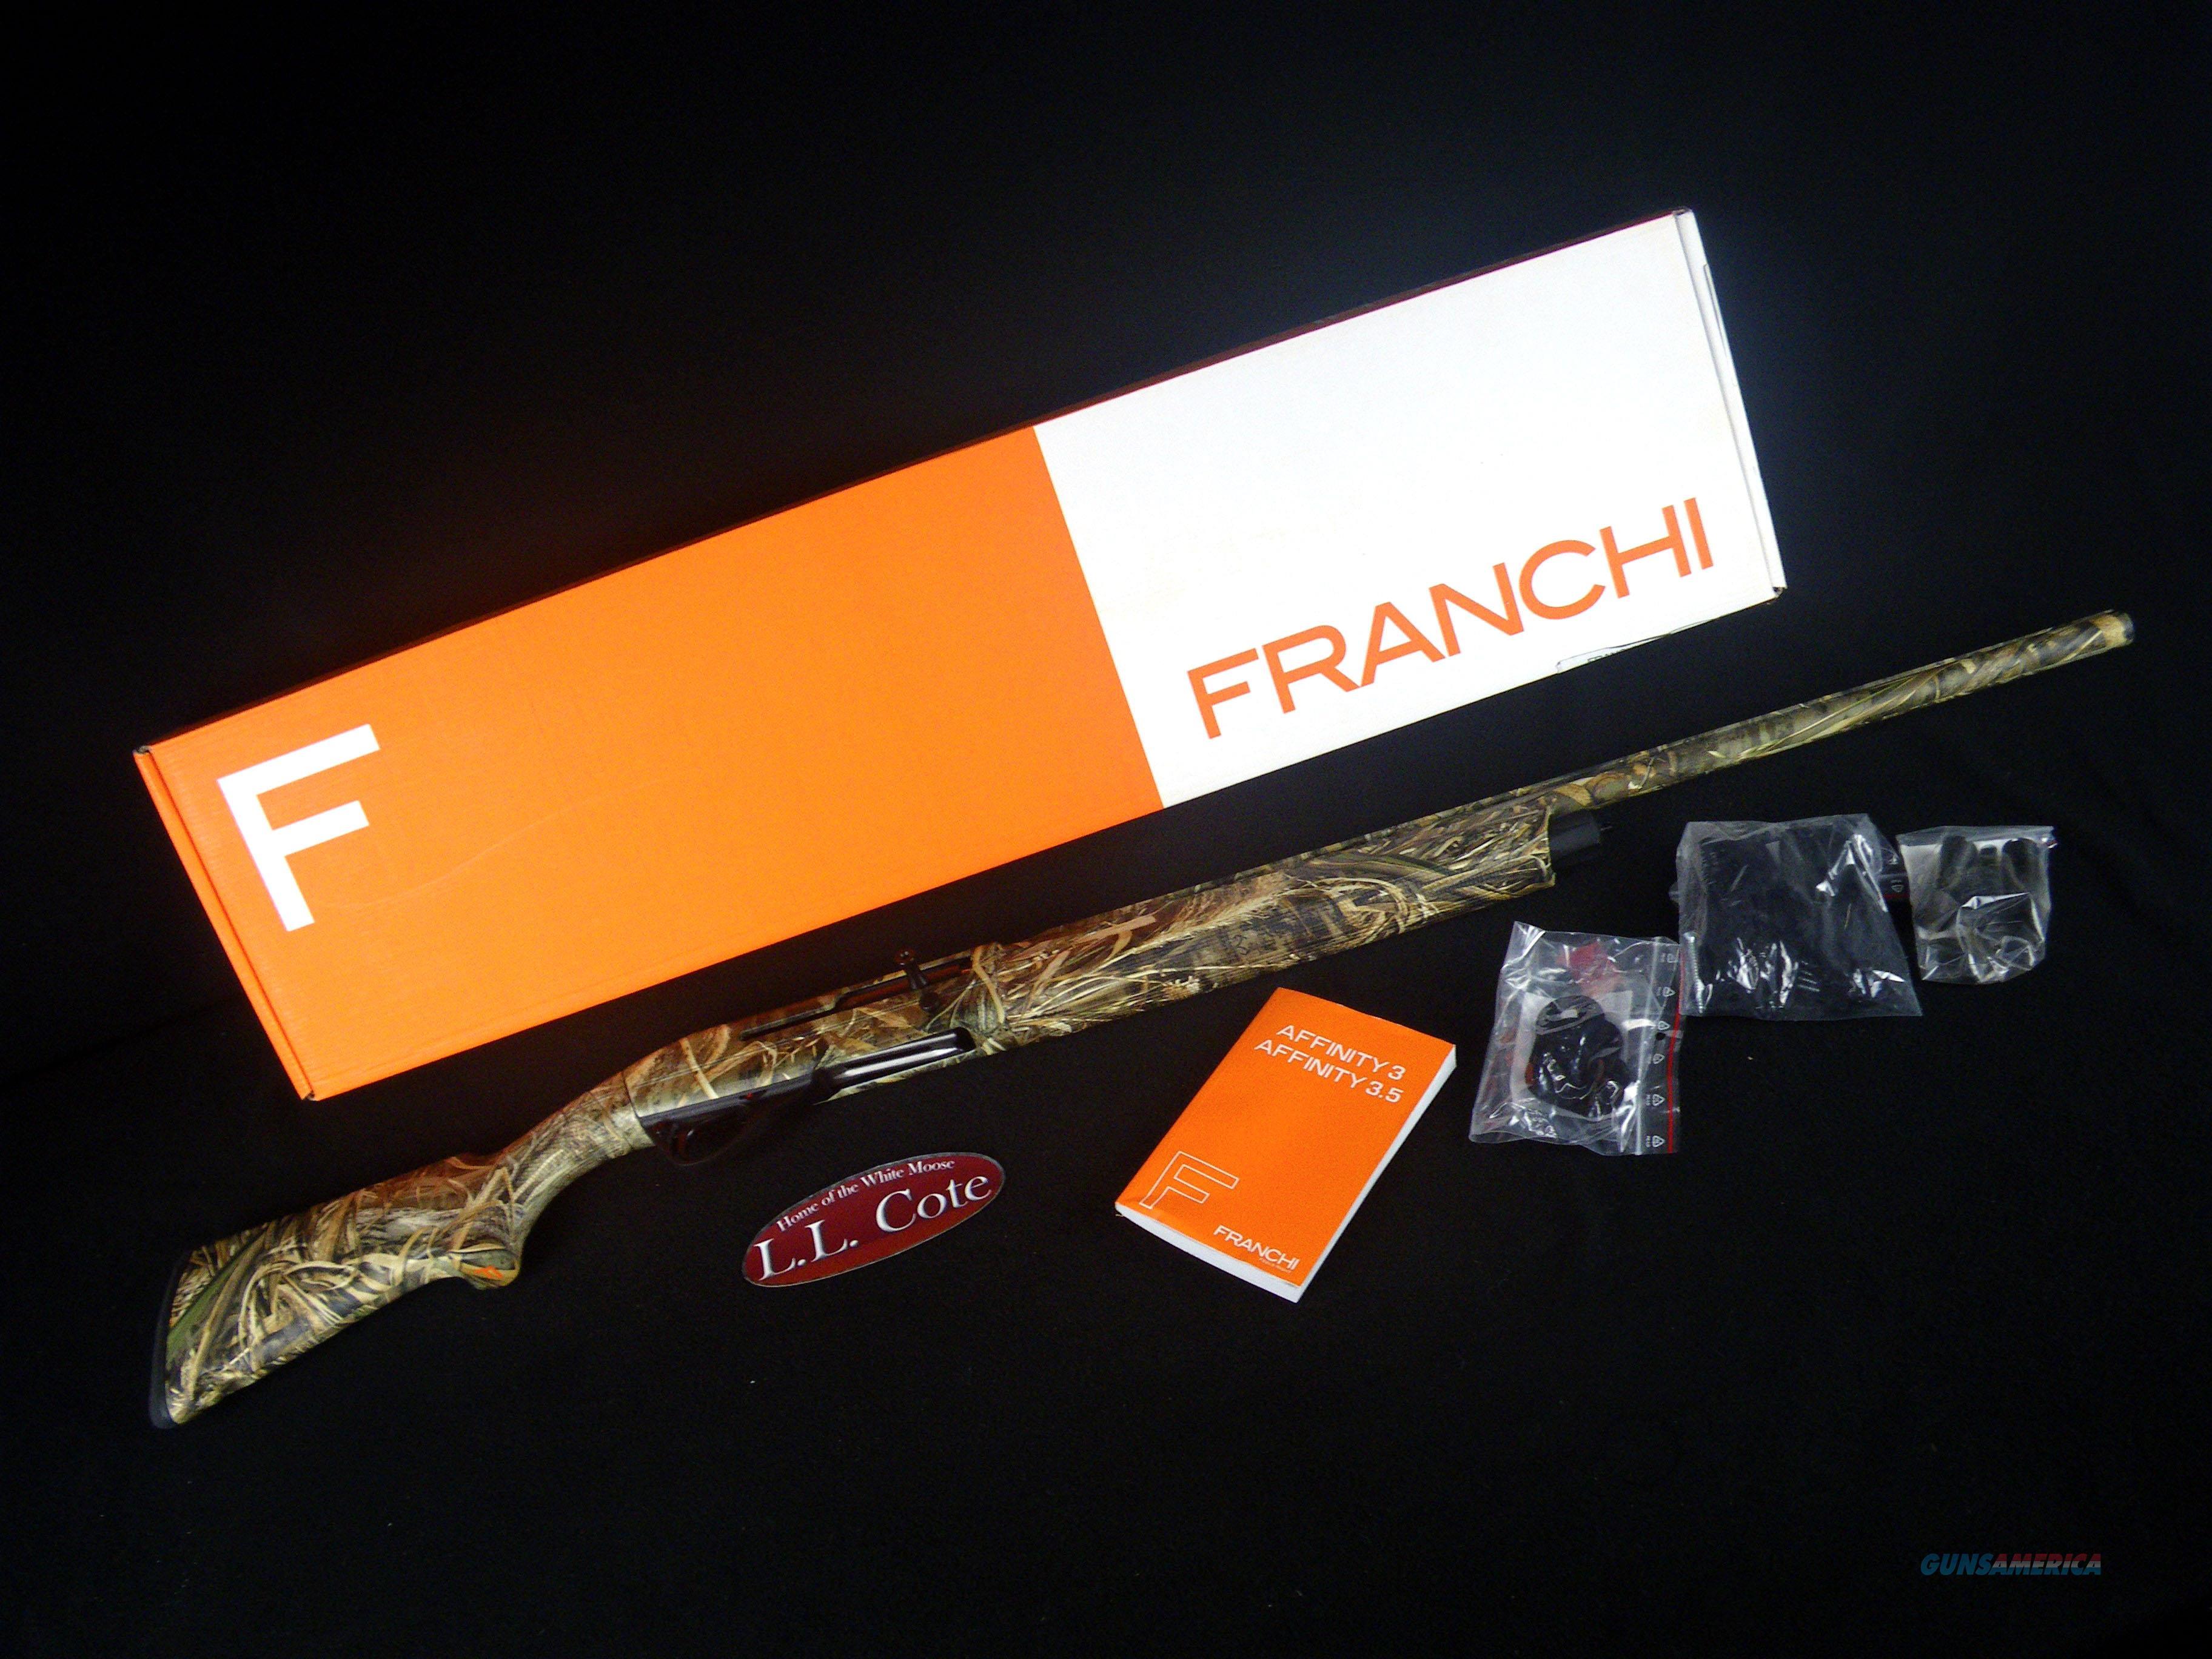 "Franchi Affinity 3 Compact Max-5 20ga 26"" NEW 3"" 41090  Guns > Shotguns > Franchi Shotguns > Auto Pump > Hunting"